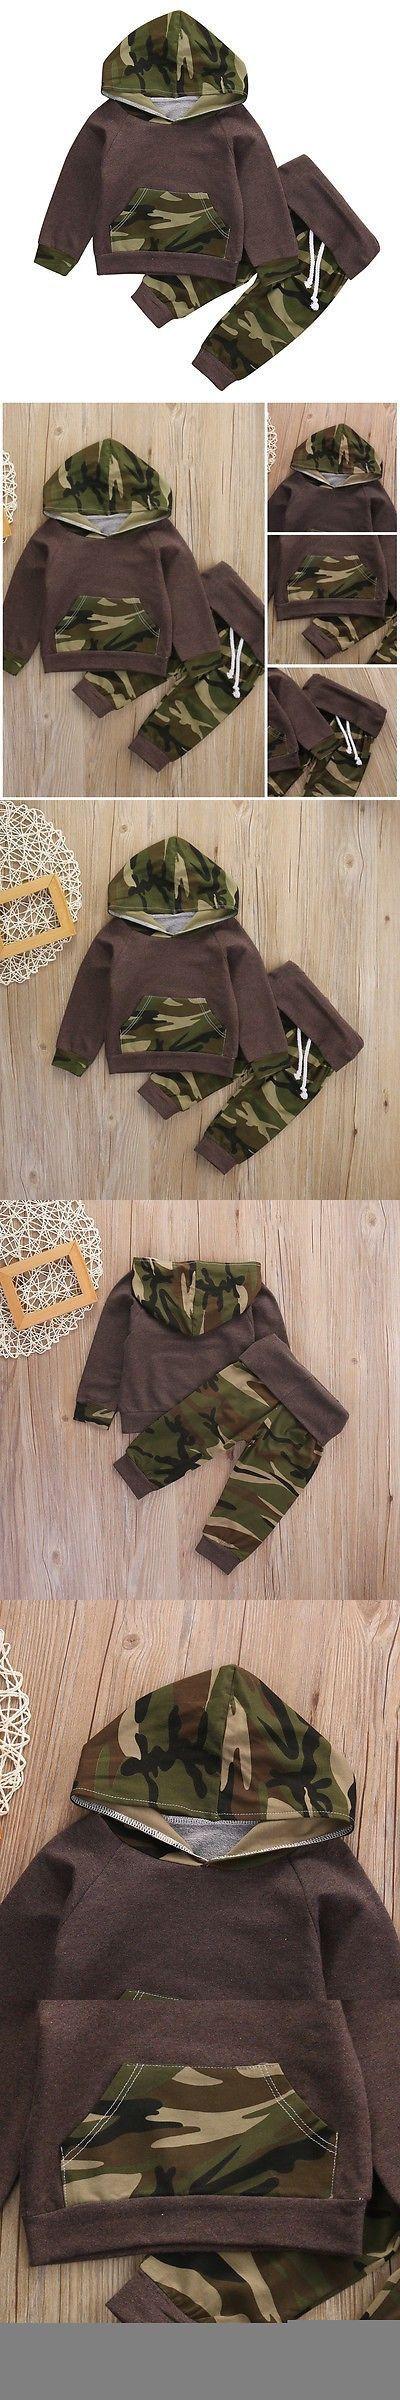 Camouflage infant kids children clothes Baby Boys Suit Tops Hoodie +Long Pants 2Pcs Outfits Set Clothes $6.99